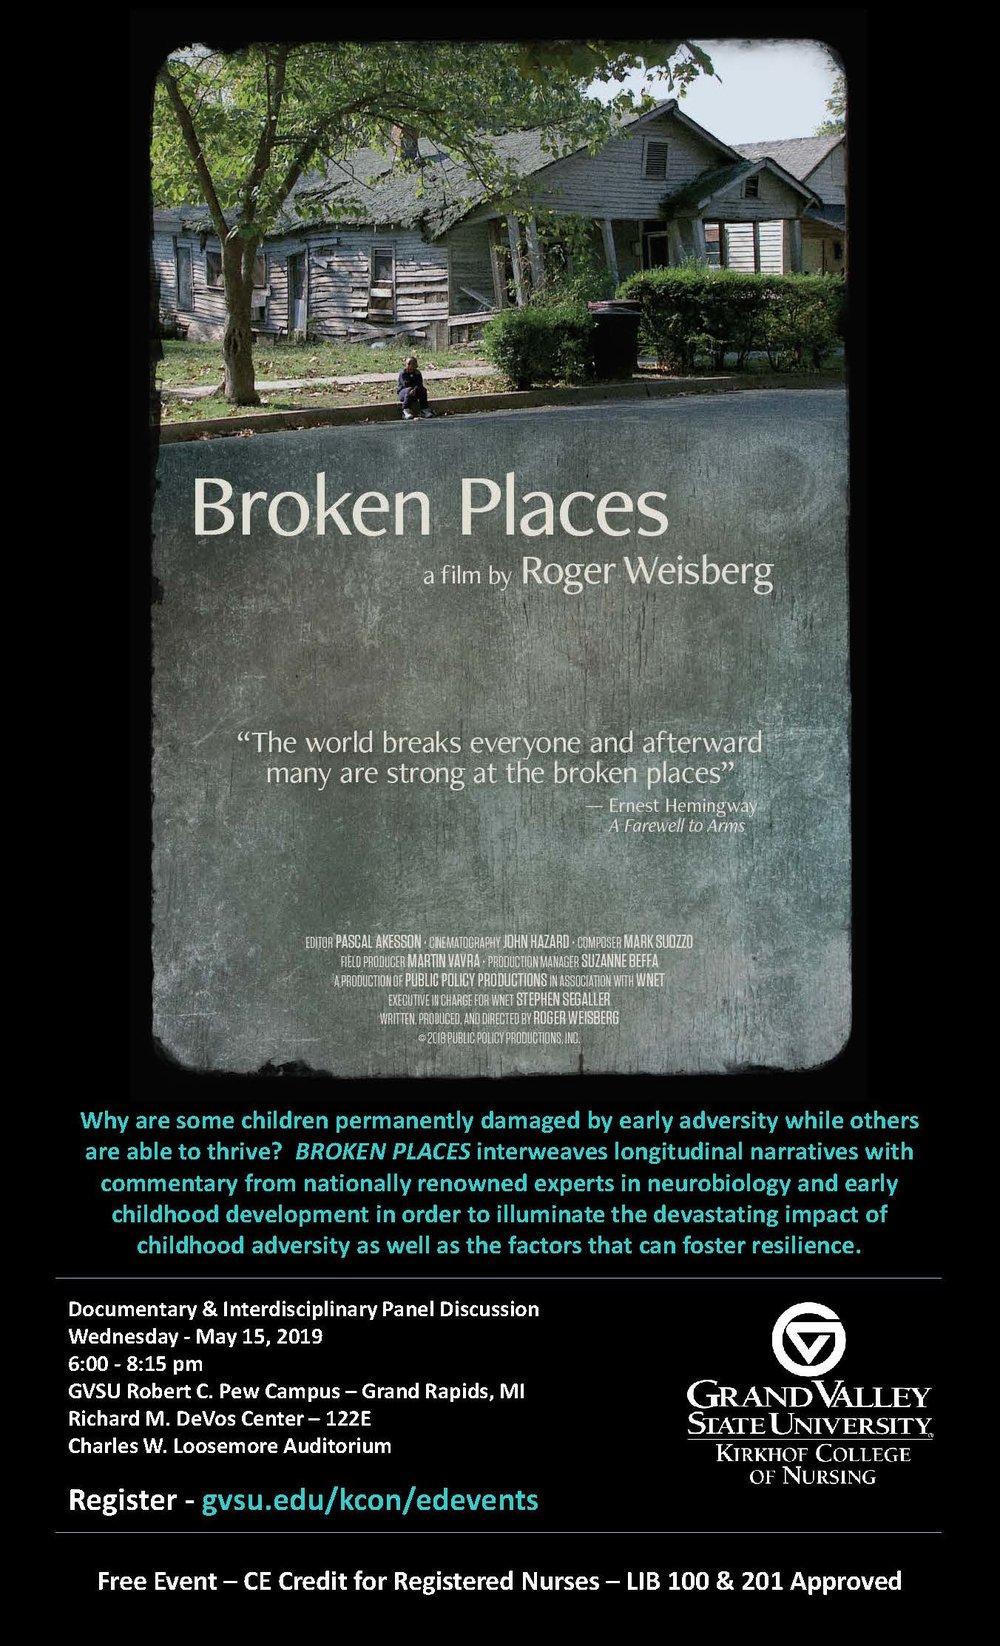 Broken Places Event Final Flyer 5-2019[1].jpg